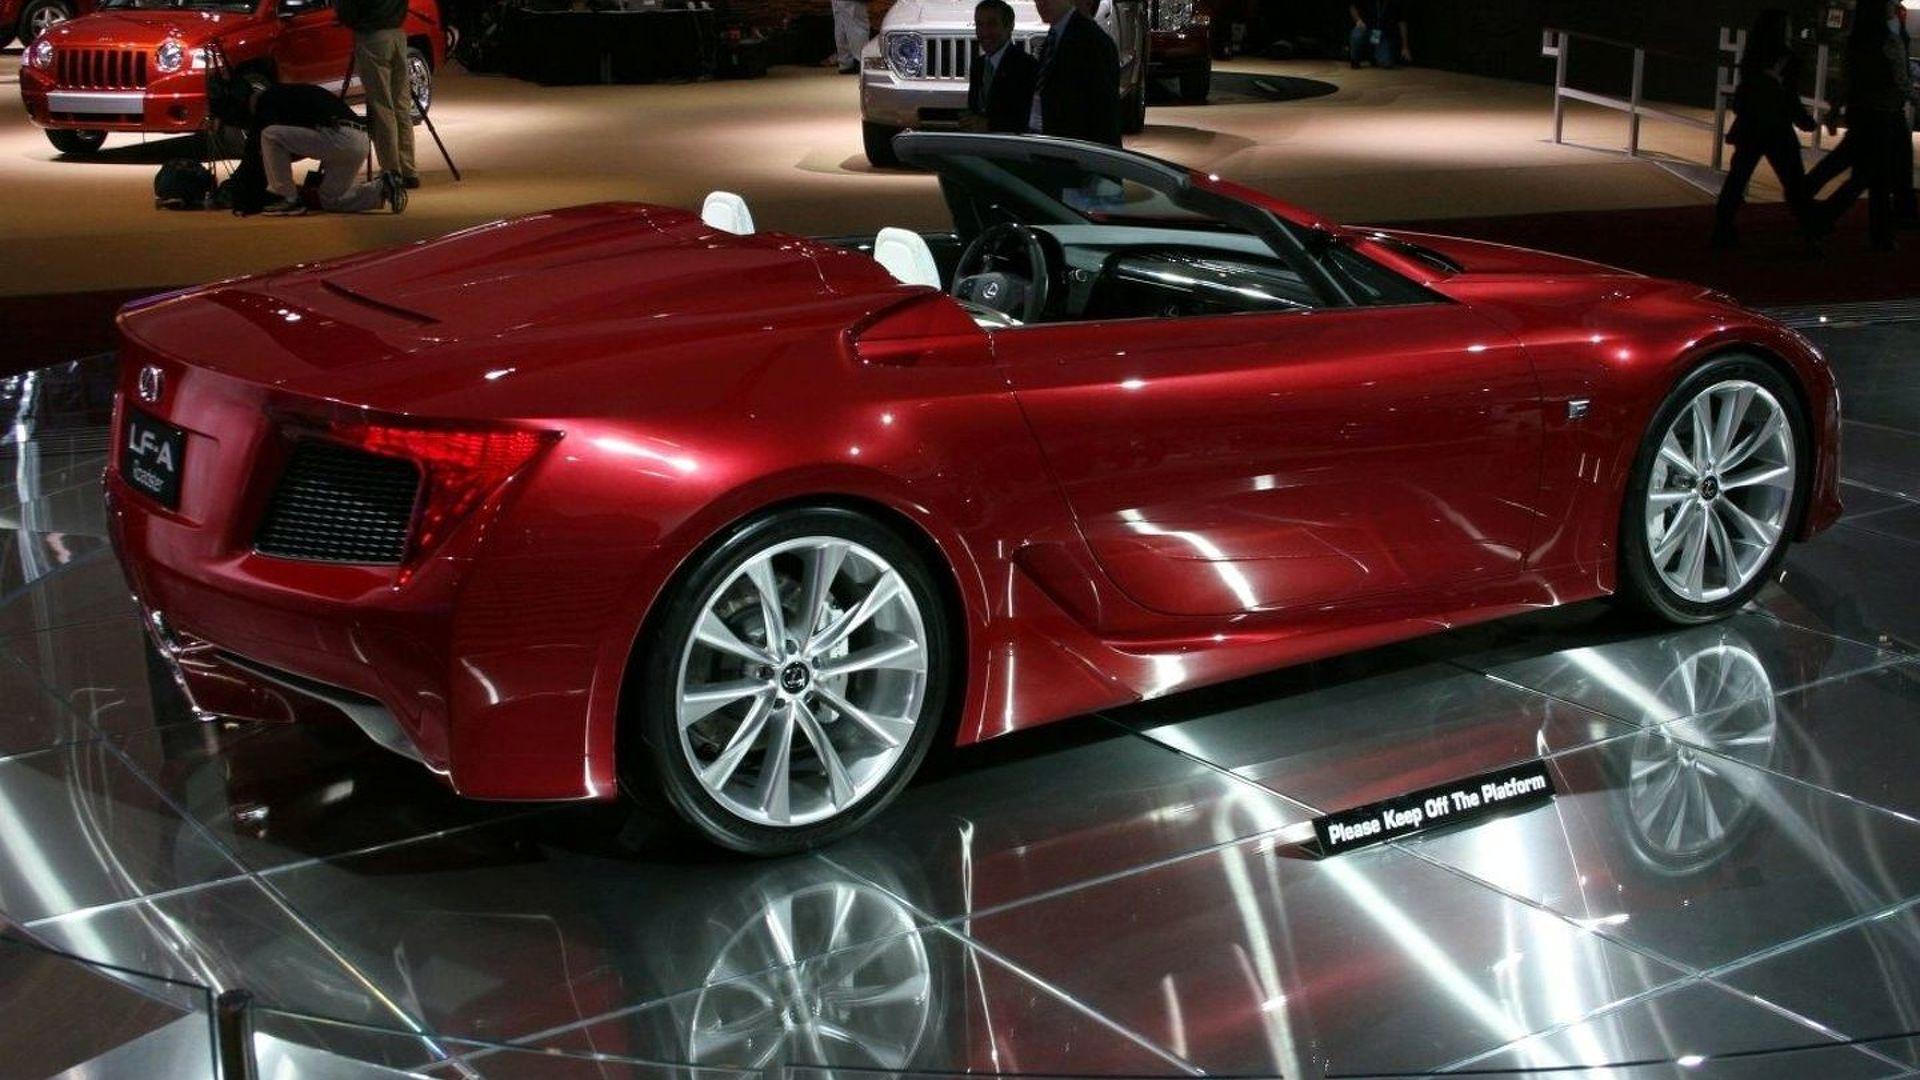 https://icdn-2.motor1.com/images/mgl/PRw2/s1/2008-24456-lexus-lf-a-roadster1.jpg